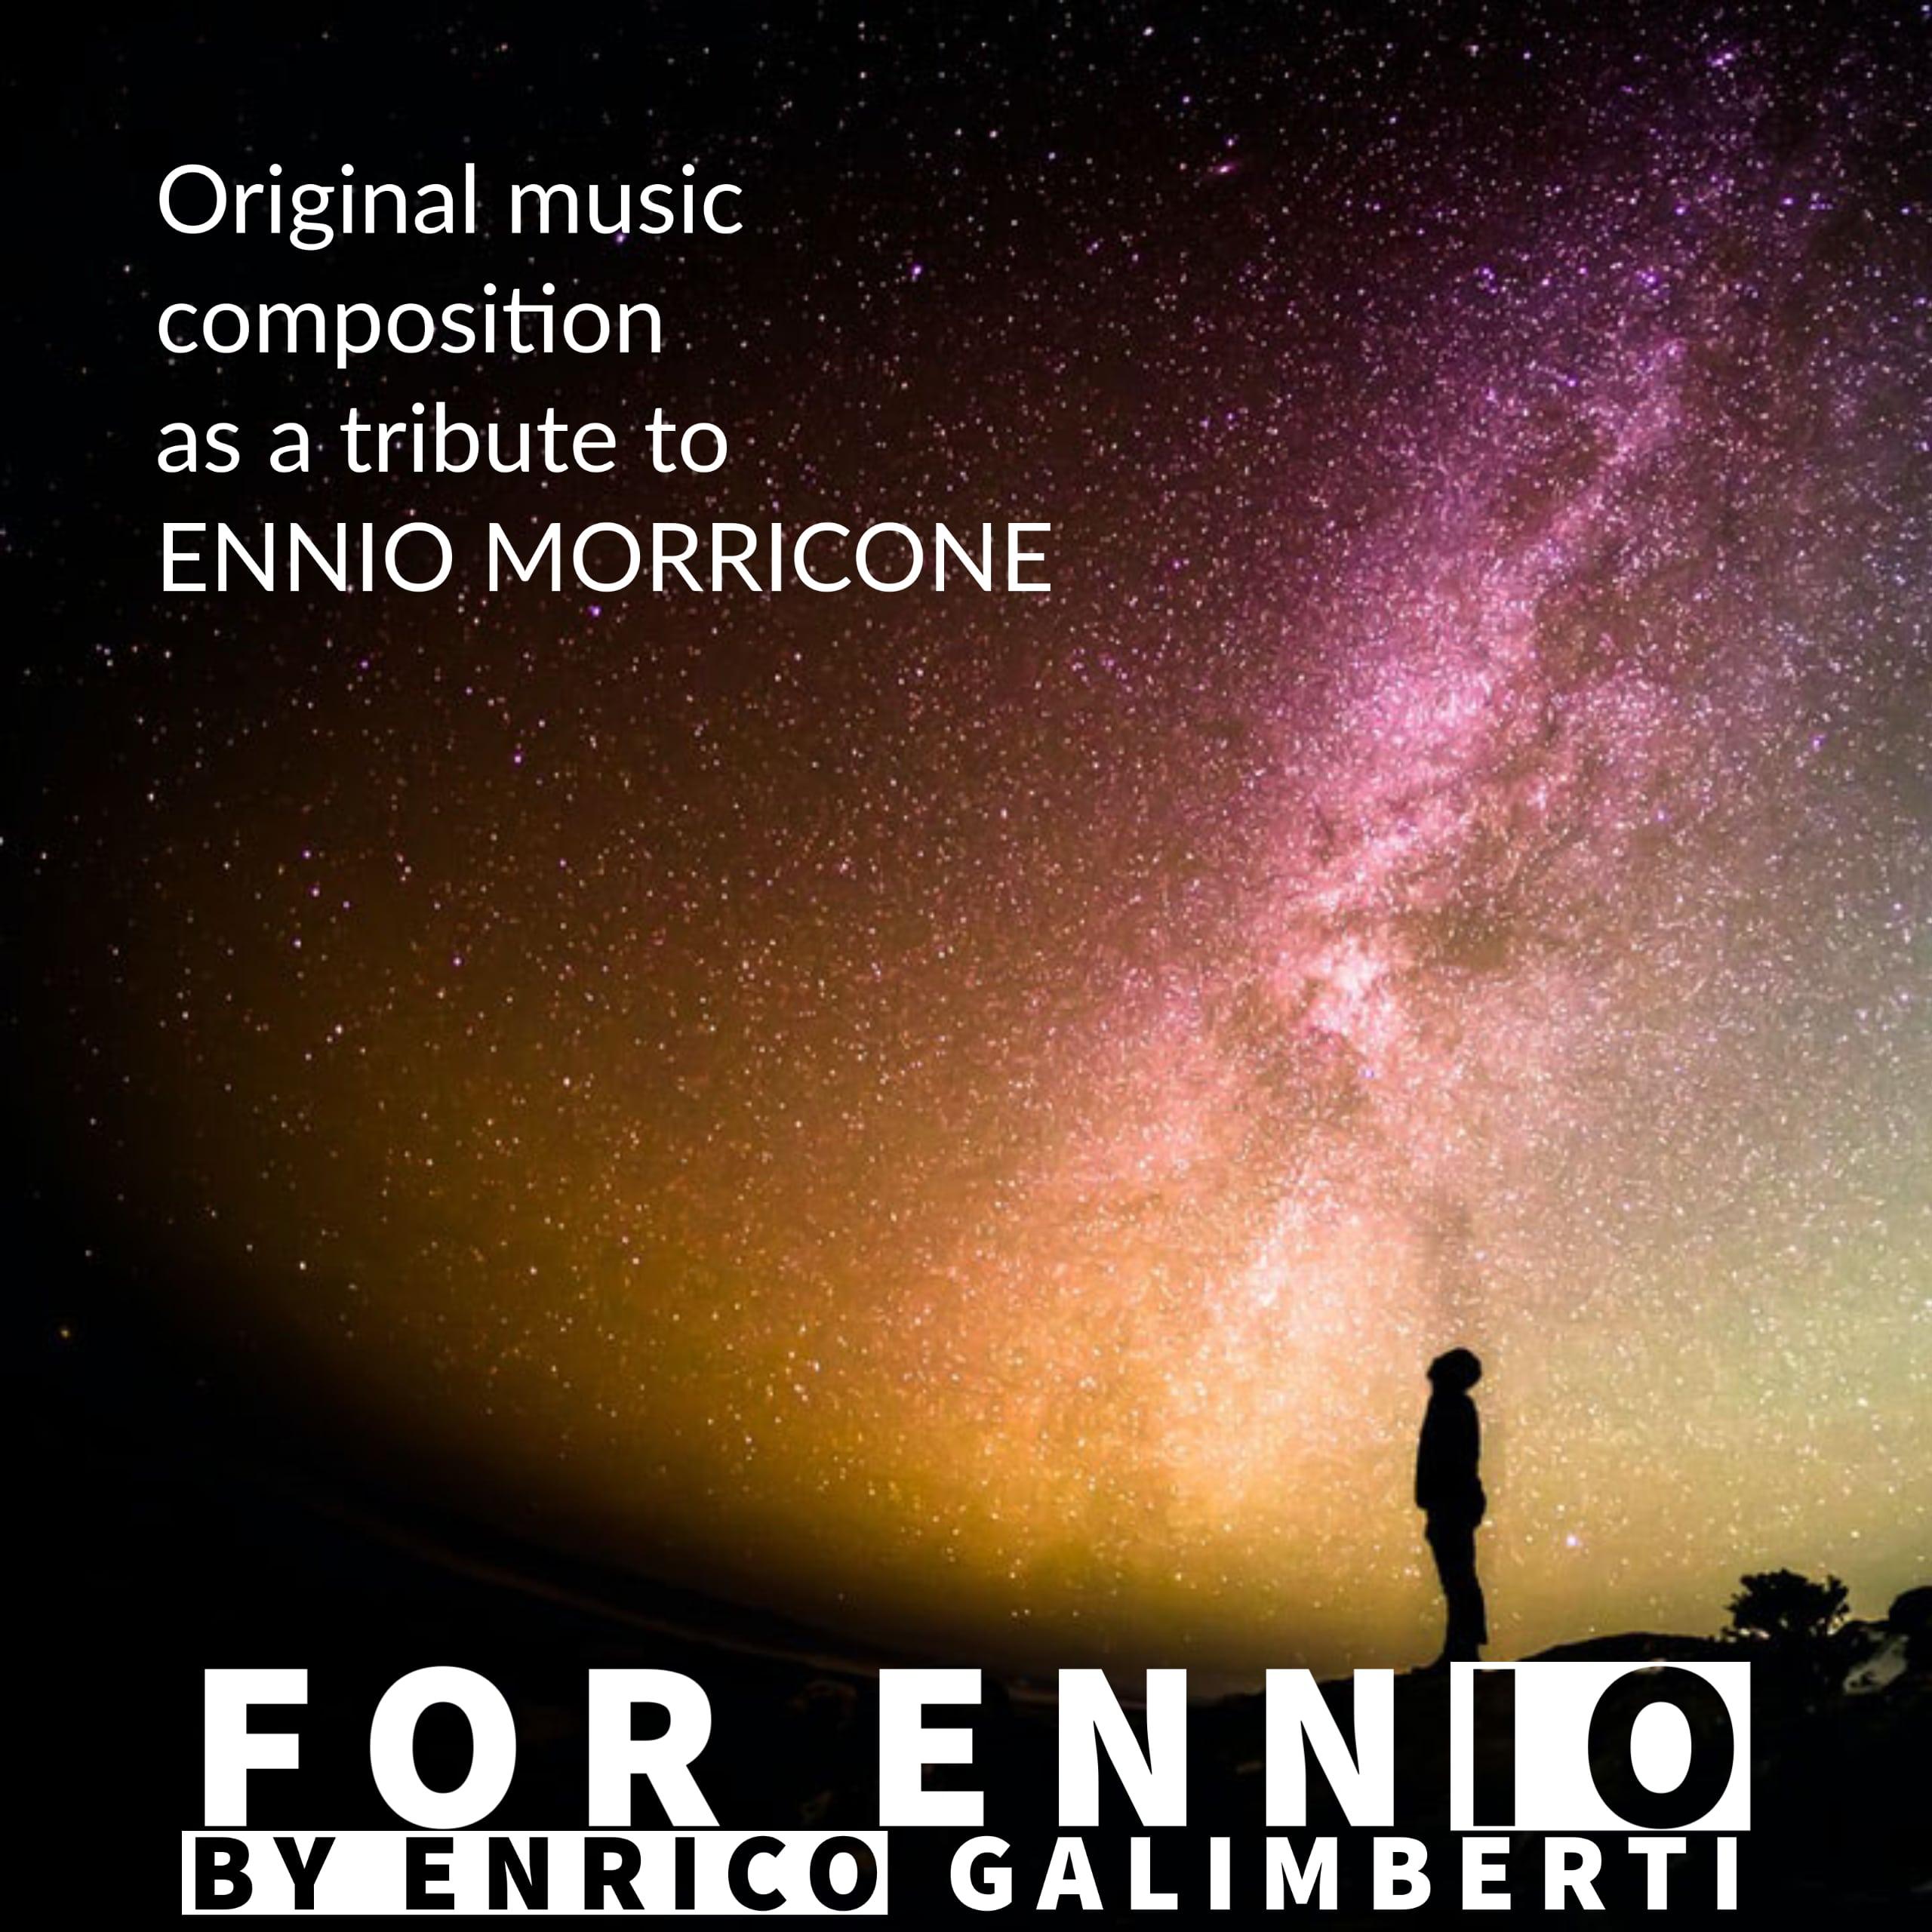 For Ennio by Enrico Galimberti Original music composition as a tribute to Ennio Morricone